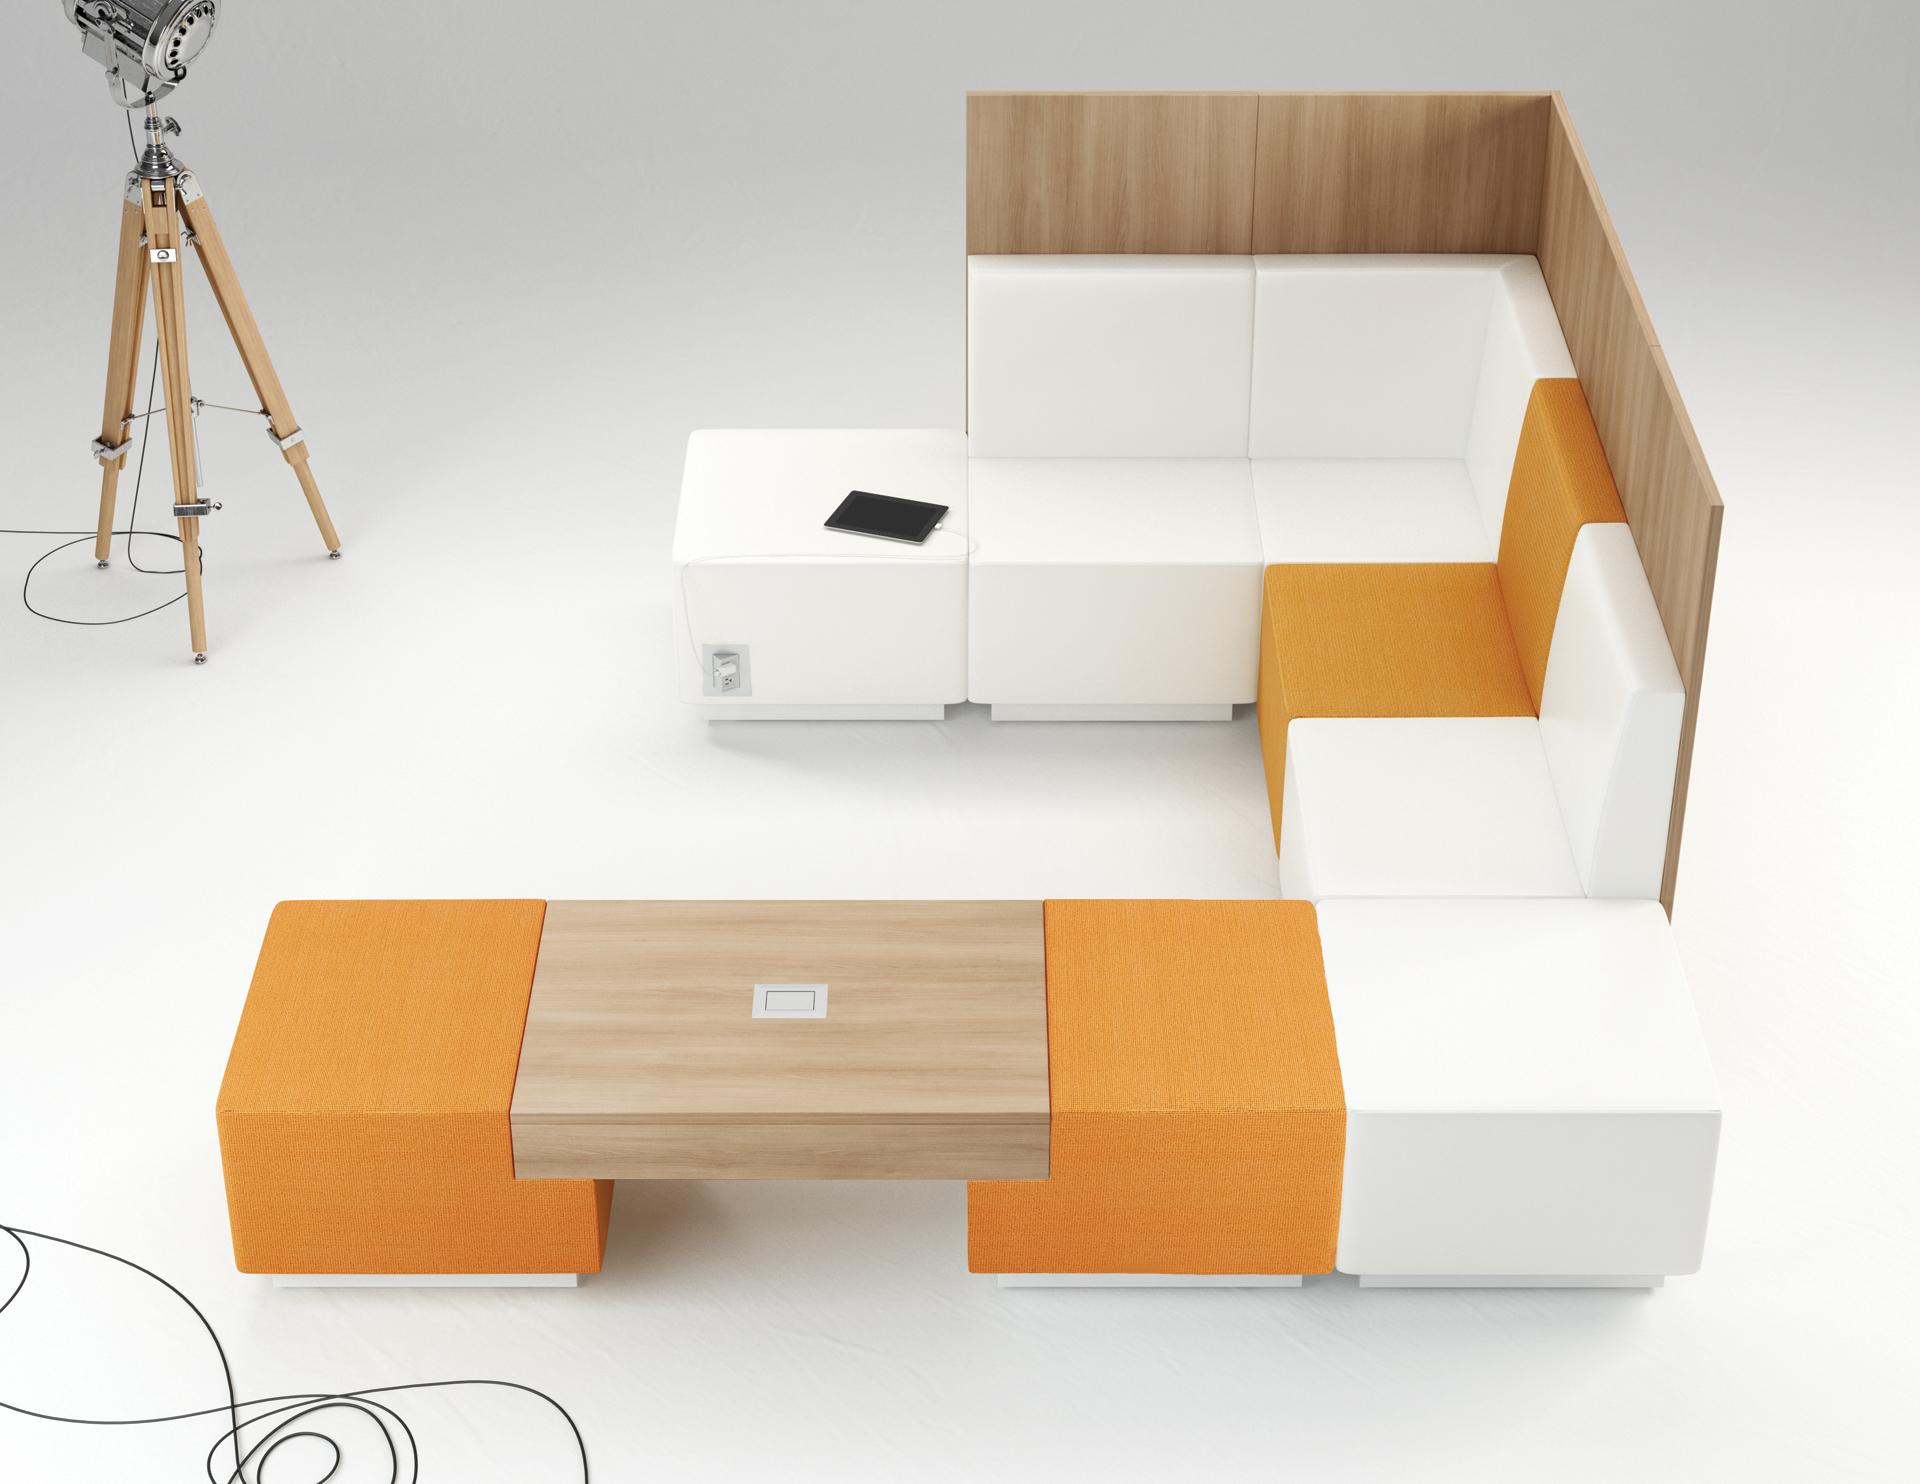 sit c002